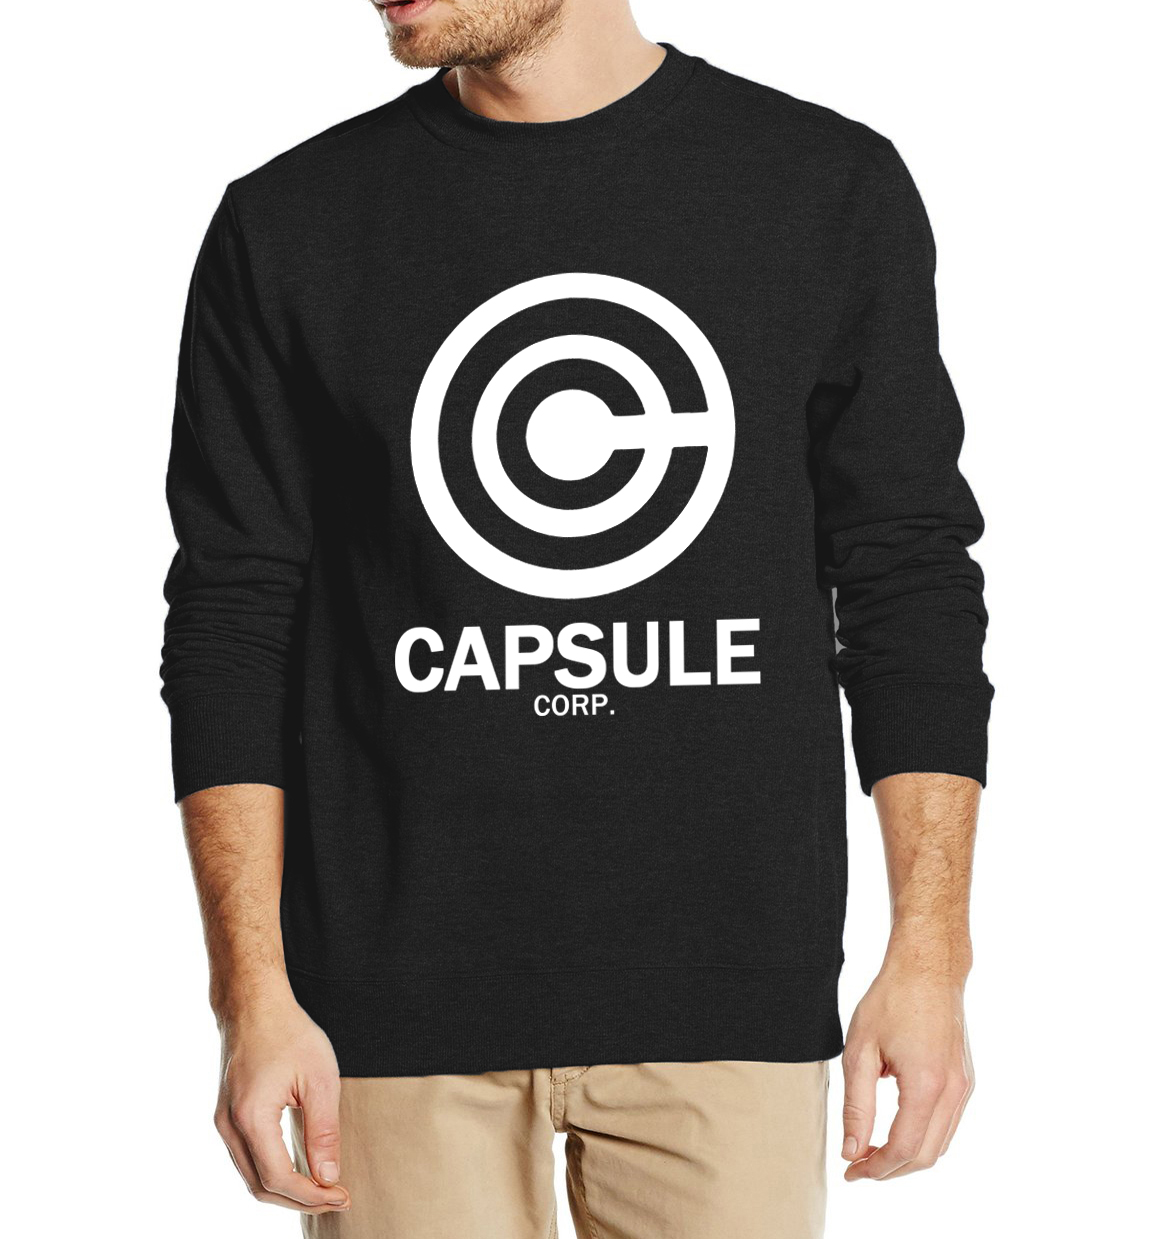 Capsule Corp Sweatshirt for Men (8 Types)